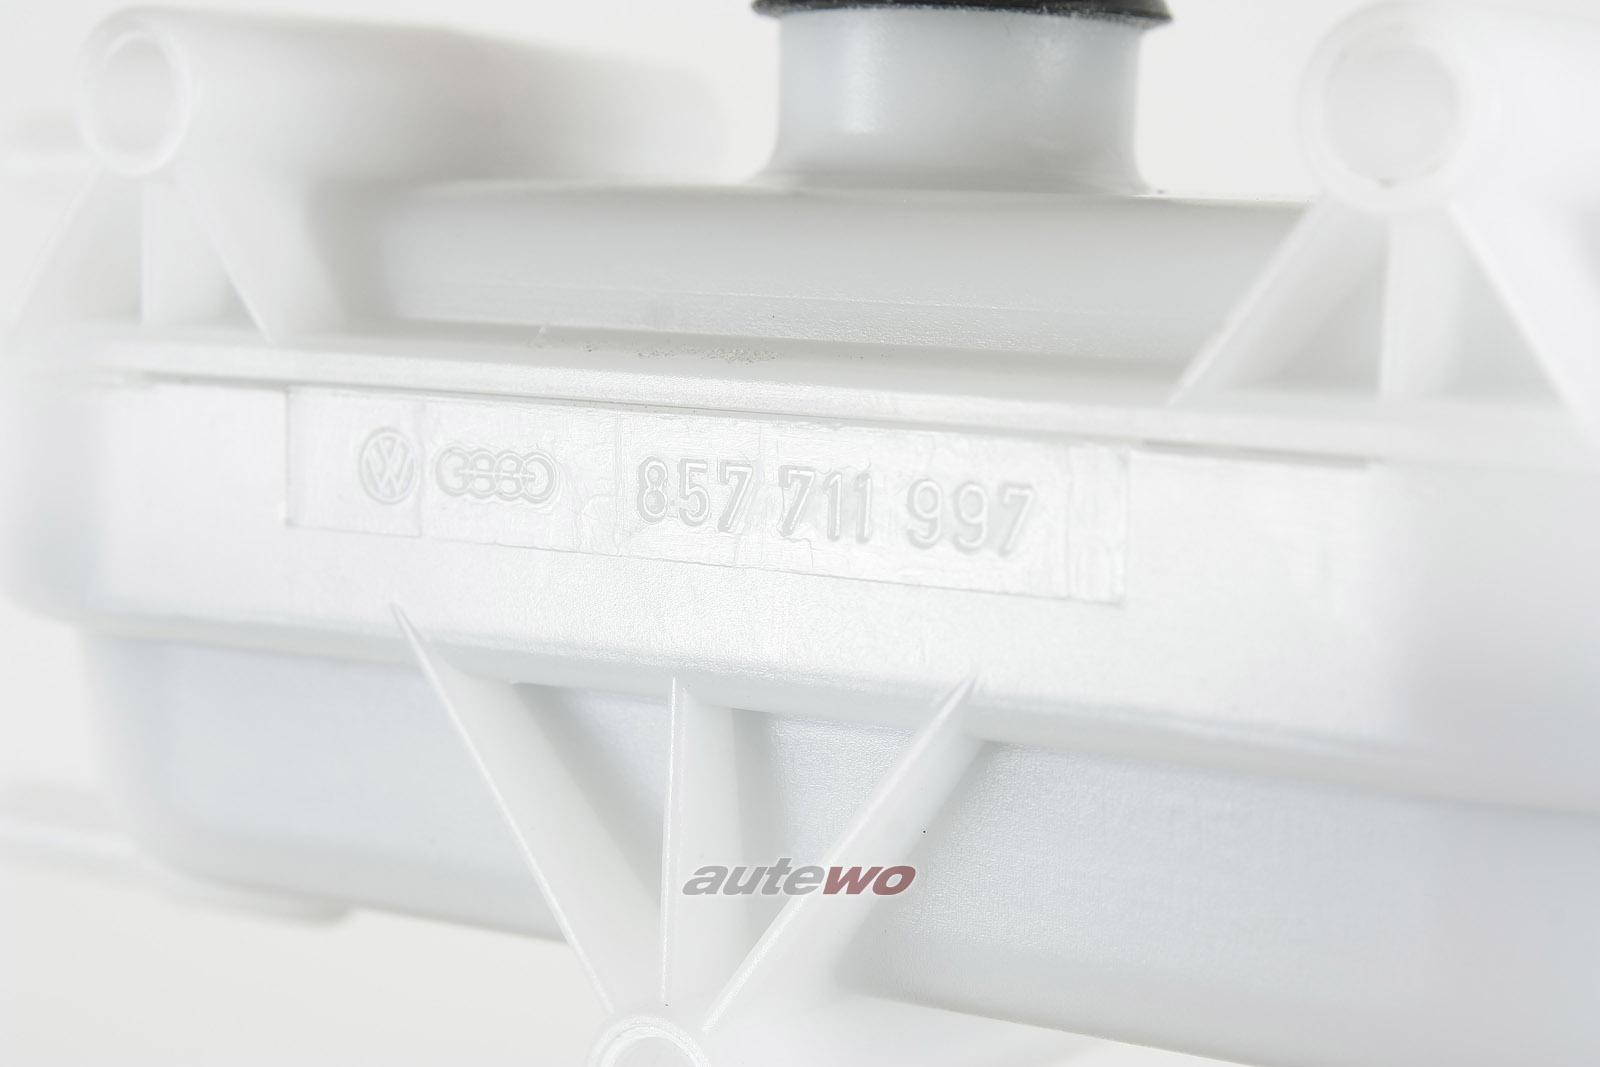 857711995A NEU Audi 80/90/Coupe 85/89/S2/Urquattro Stellelement Differential